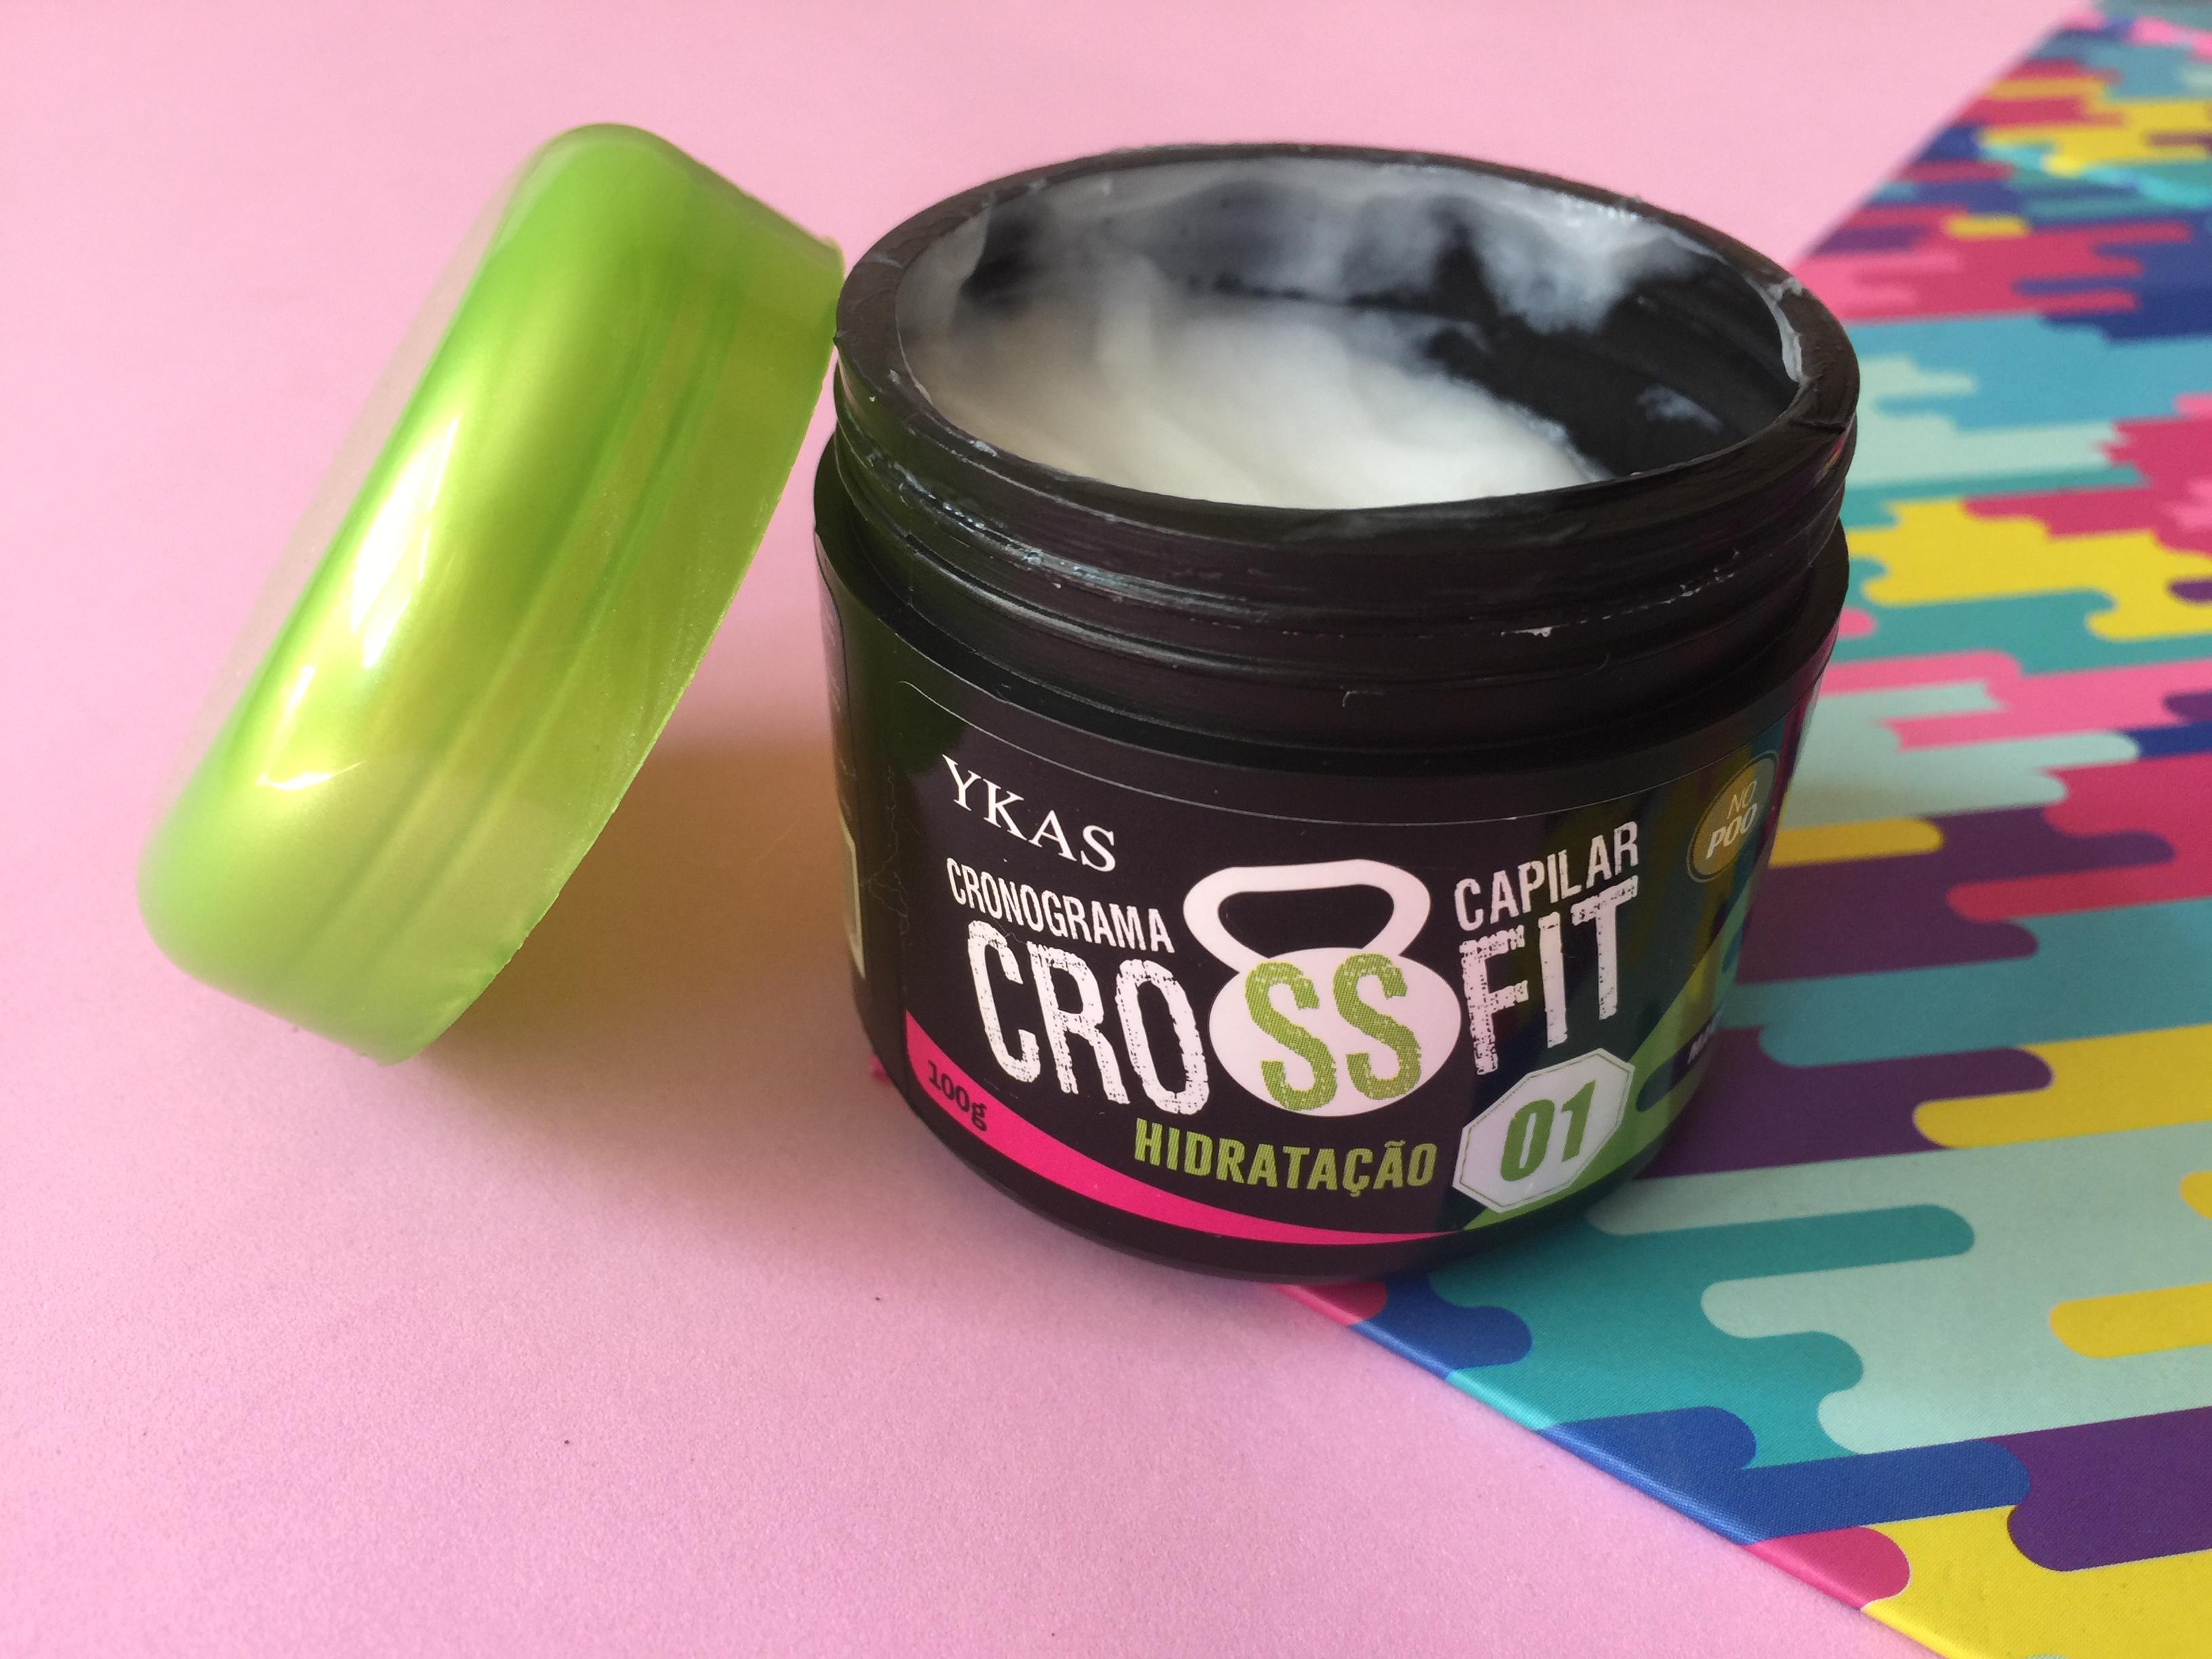 CrossFit Ykas Cronograma Capilar | Eu testei!